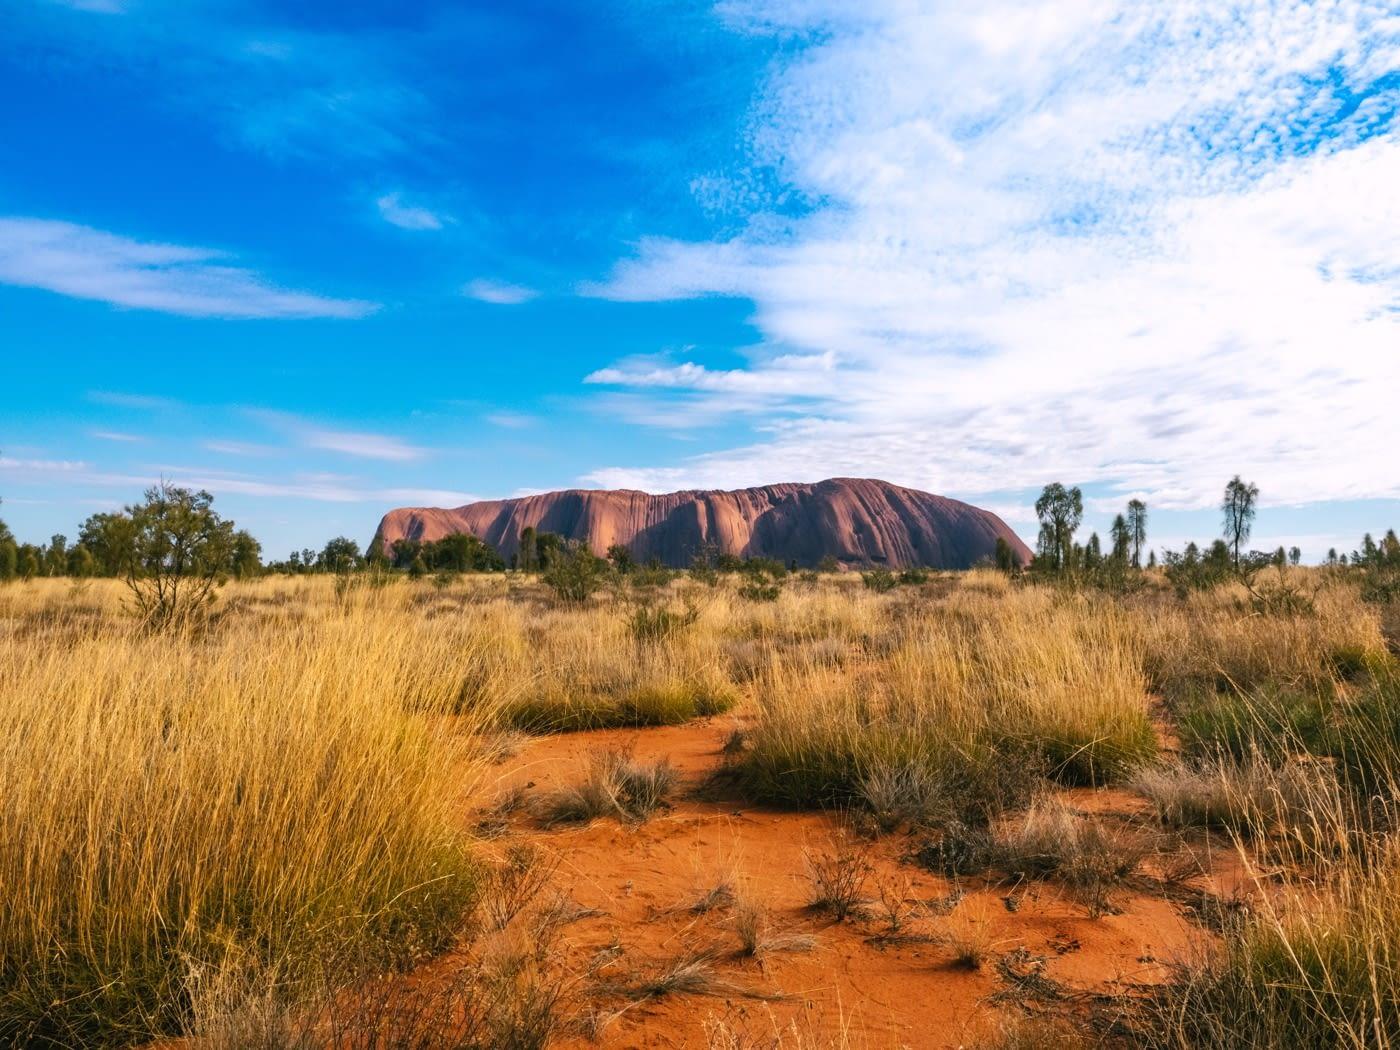 NT Australia - Spending the morning at Uluru